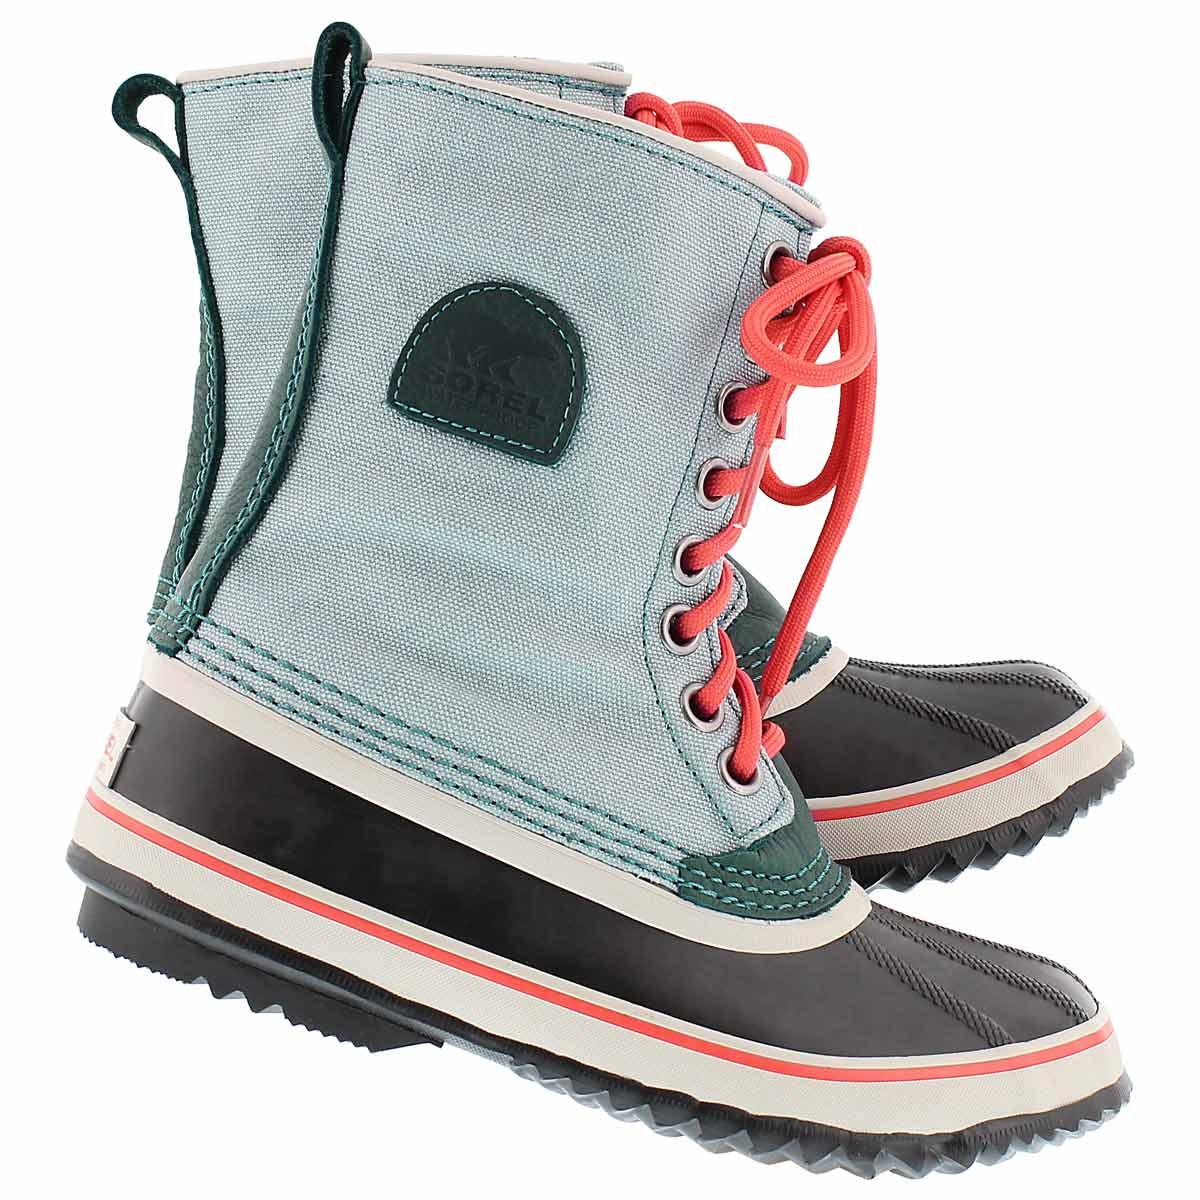 Sorel women s 1964 premium cvs blue winter boots 1413051 938